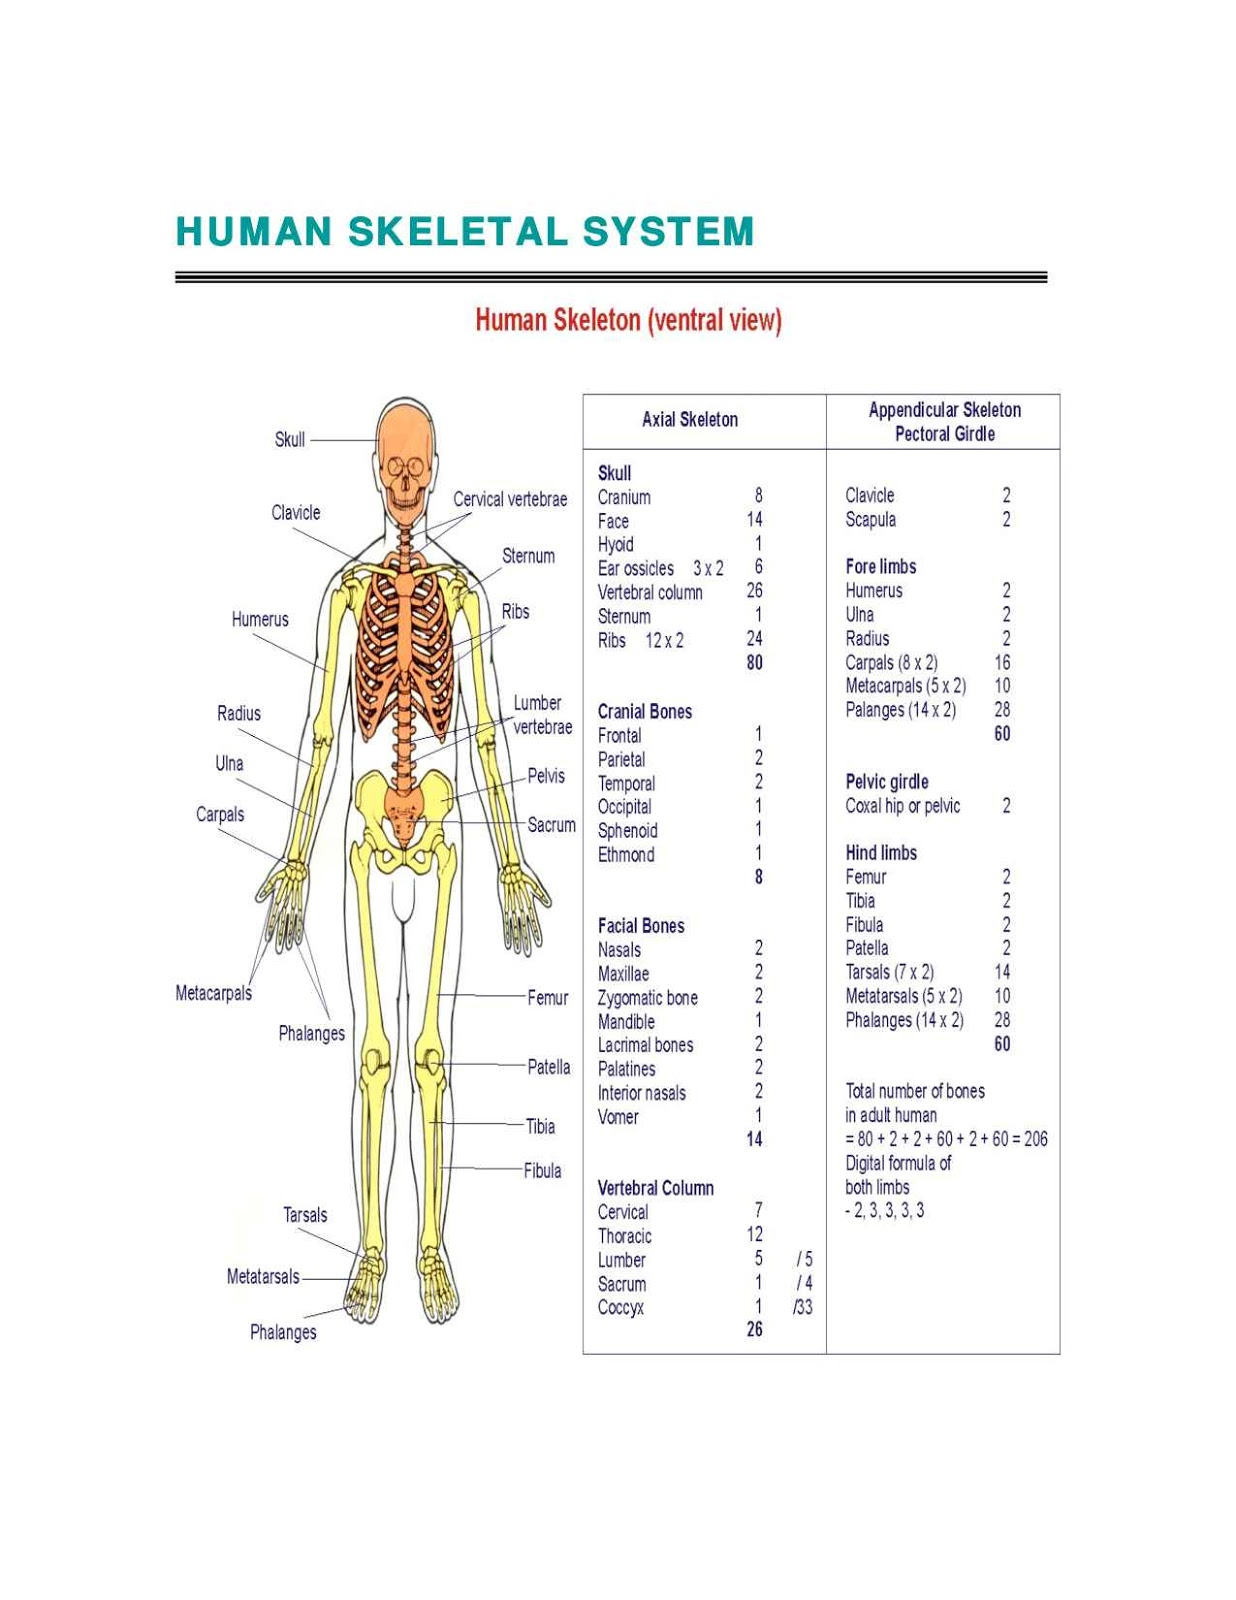 Human Skeletal System Diagram - coordstudenti